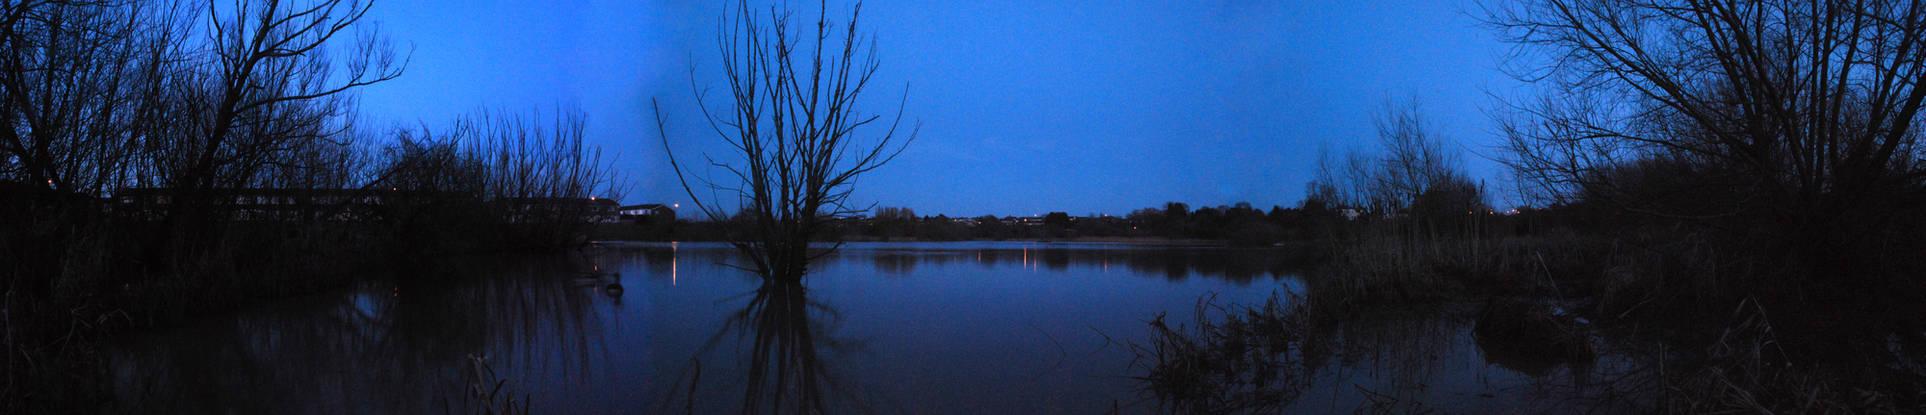 A LOVELY EVENING - Stoke Floods, West Midlands, UK